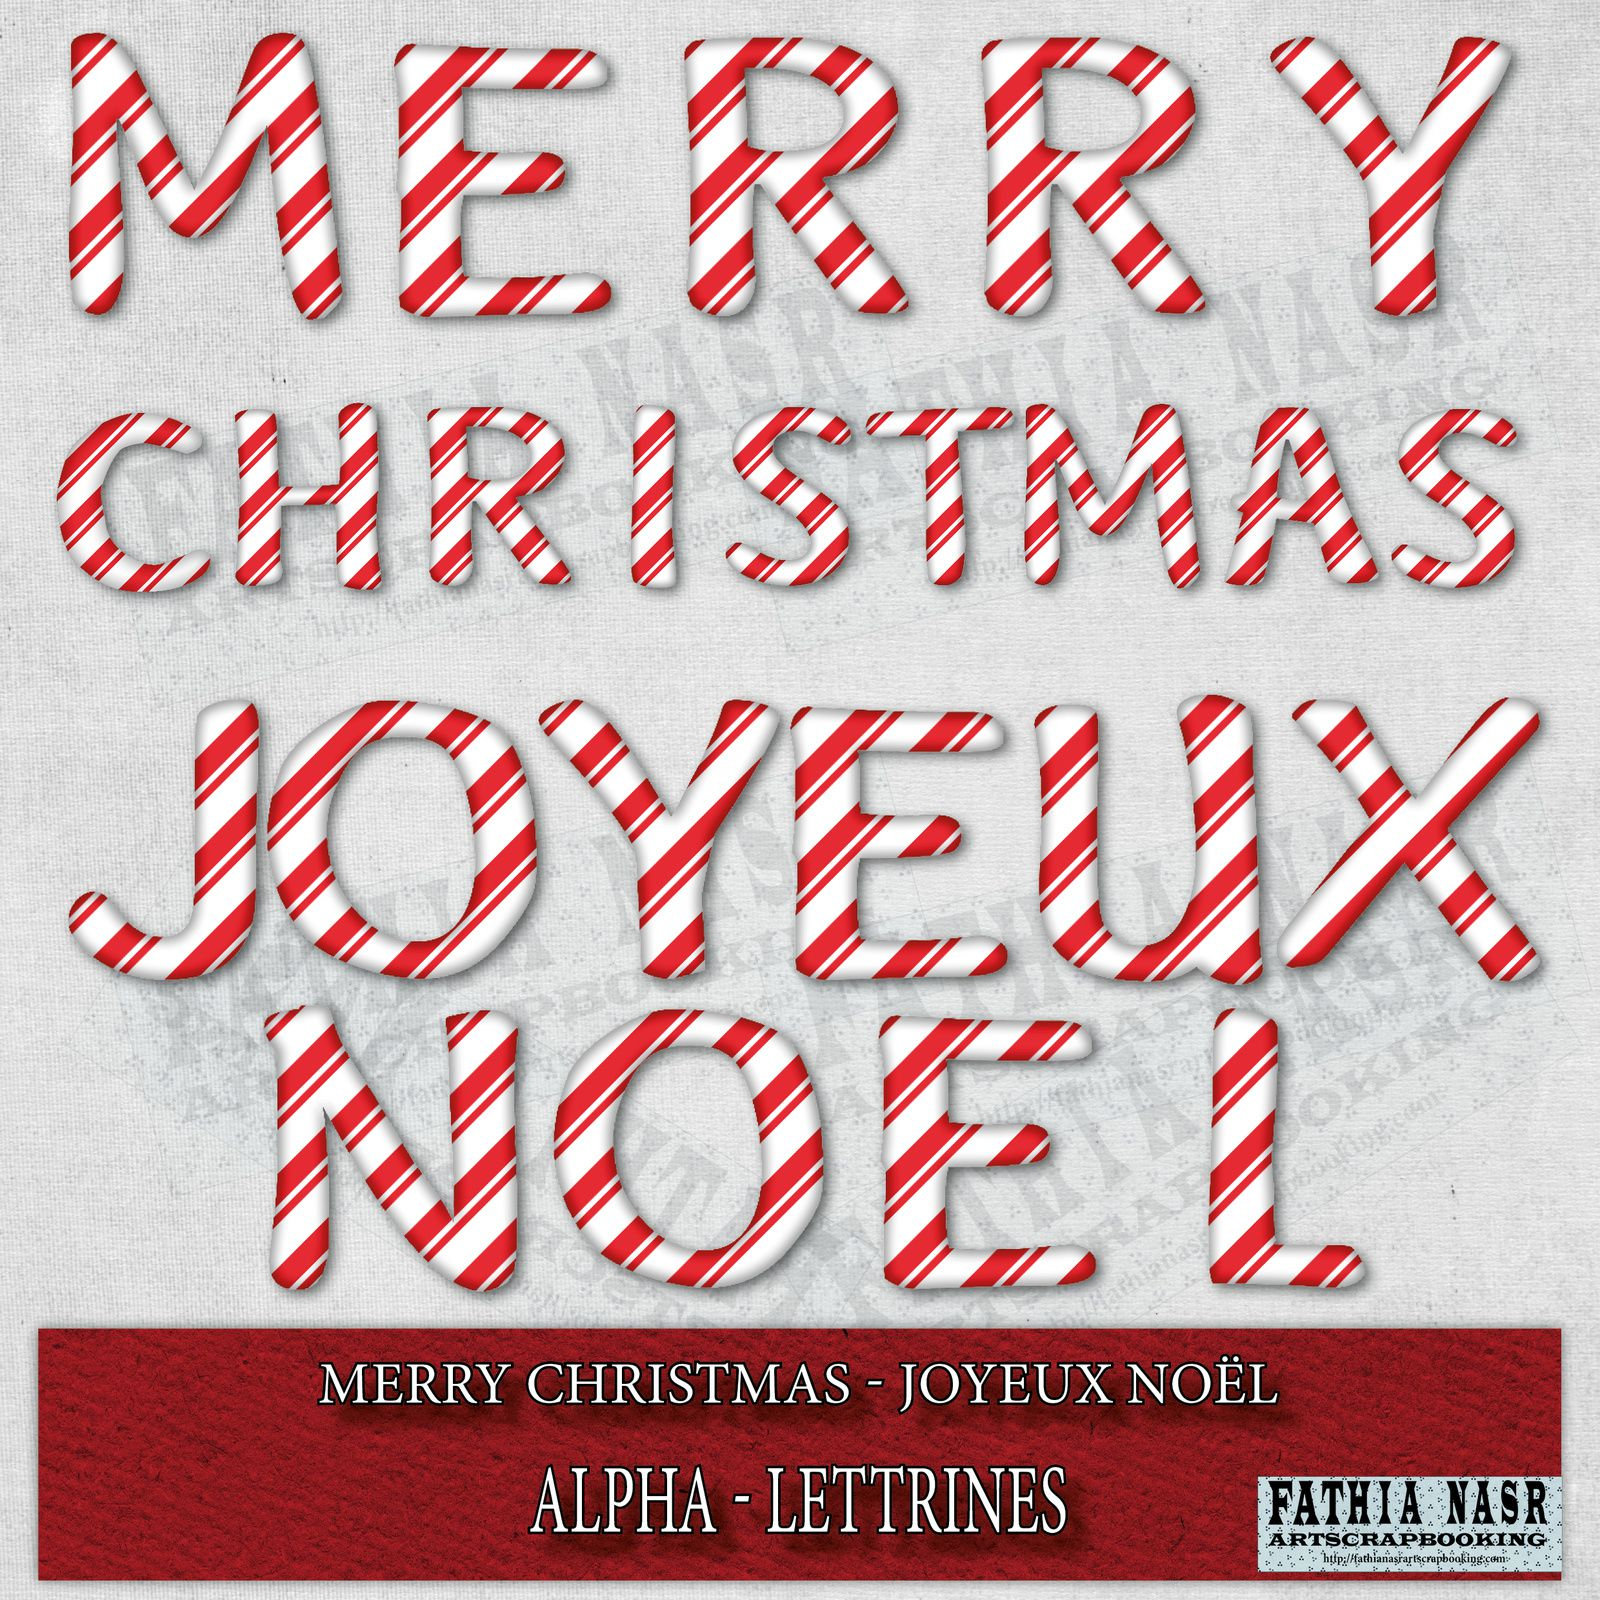 mini-kit-scrapbomini-kit-scrapbooking-digital-en-telechargement-gratuitement-joyeux-noel-merry-christmas-christmas Alphas-Lettrines Noël-Textures-Papers-Word-Arts-